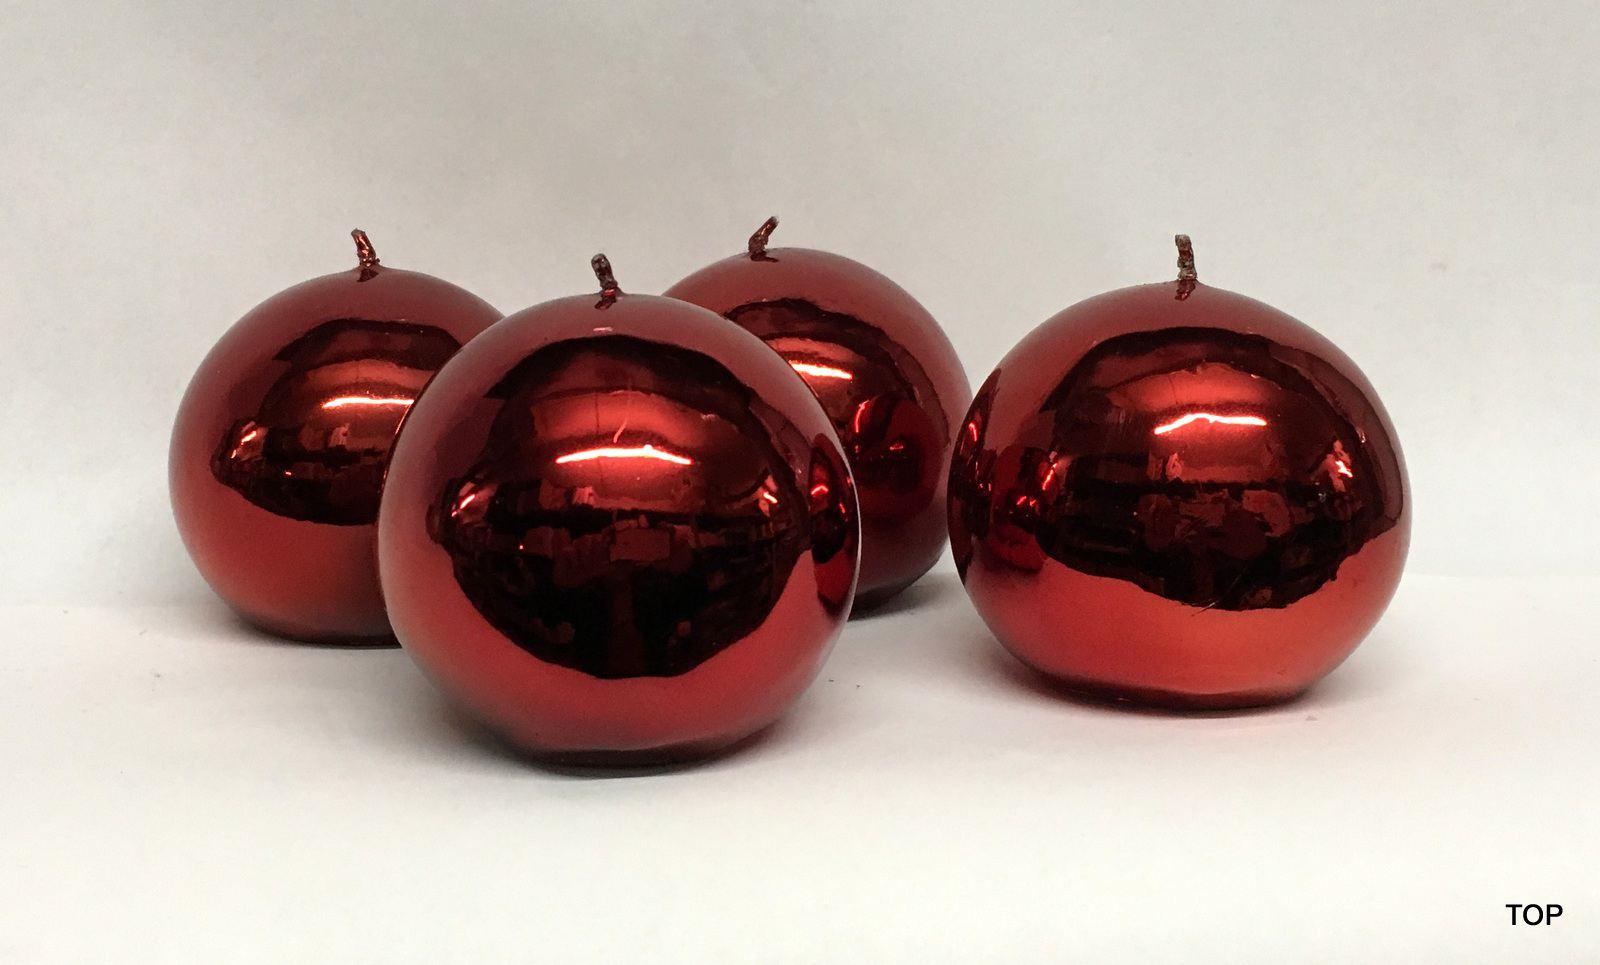 kerzen kugelkerzen k252r 6 2 cm durchmesser gl nzend farbe rot 4er set. Black Bedroom Furniture Sets. Home Design Ideas